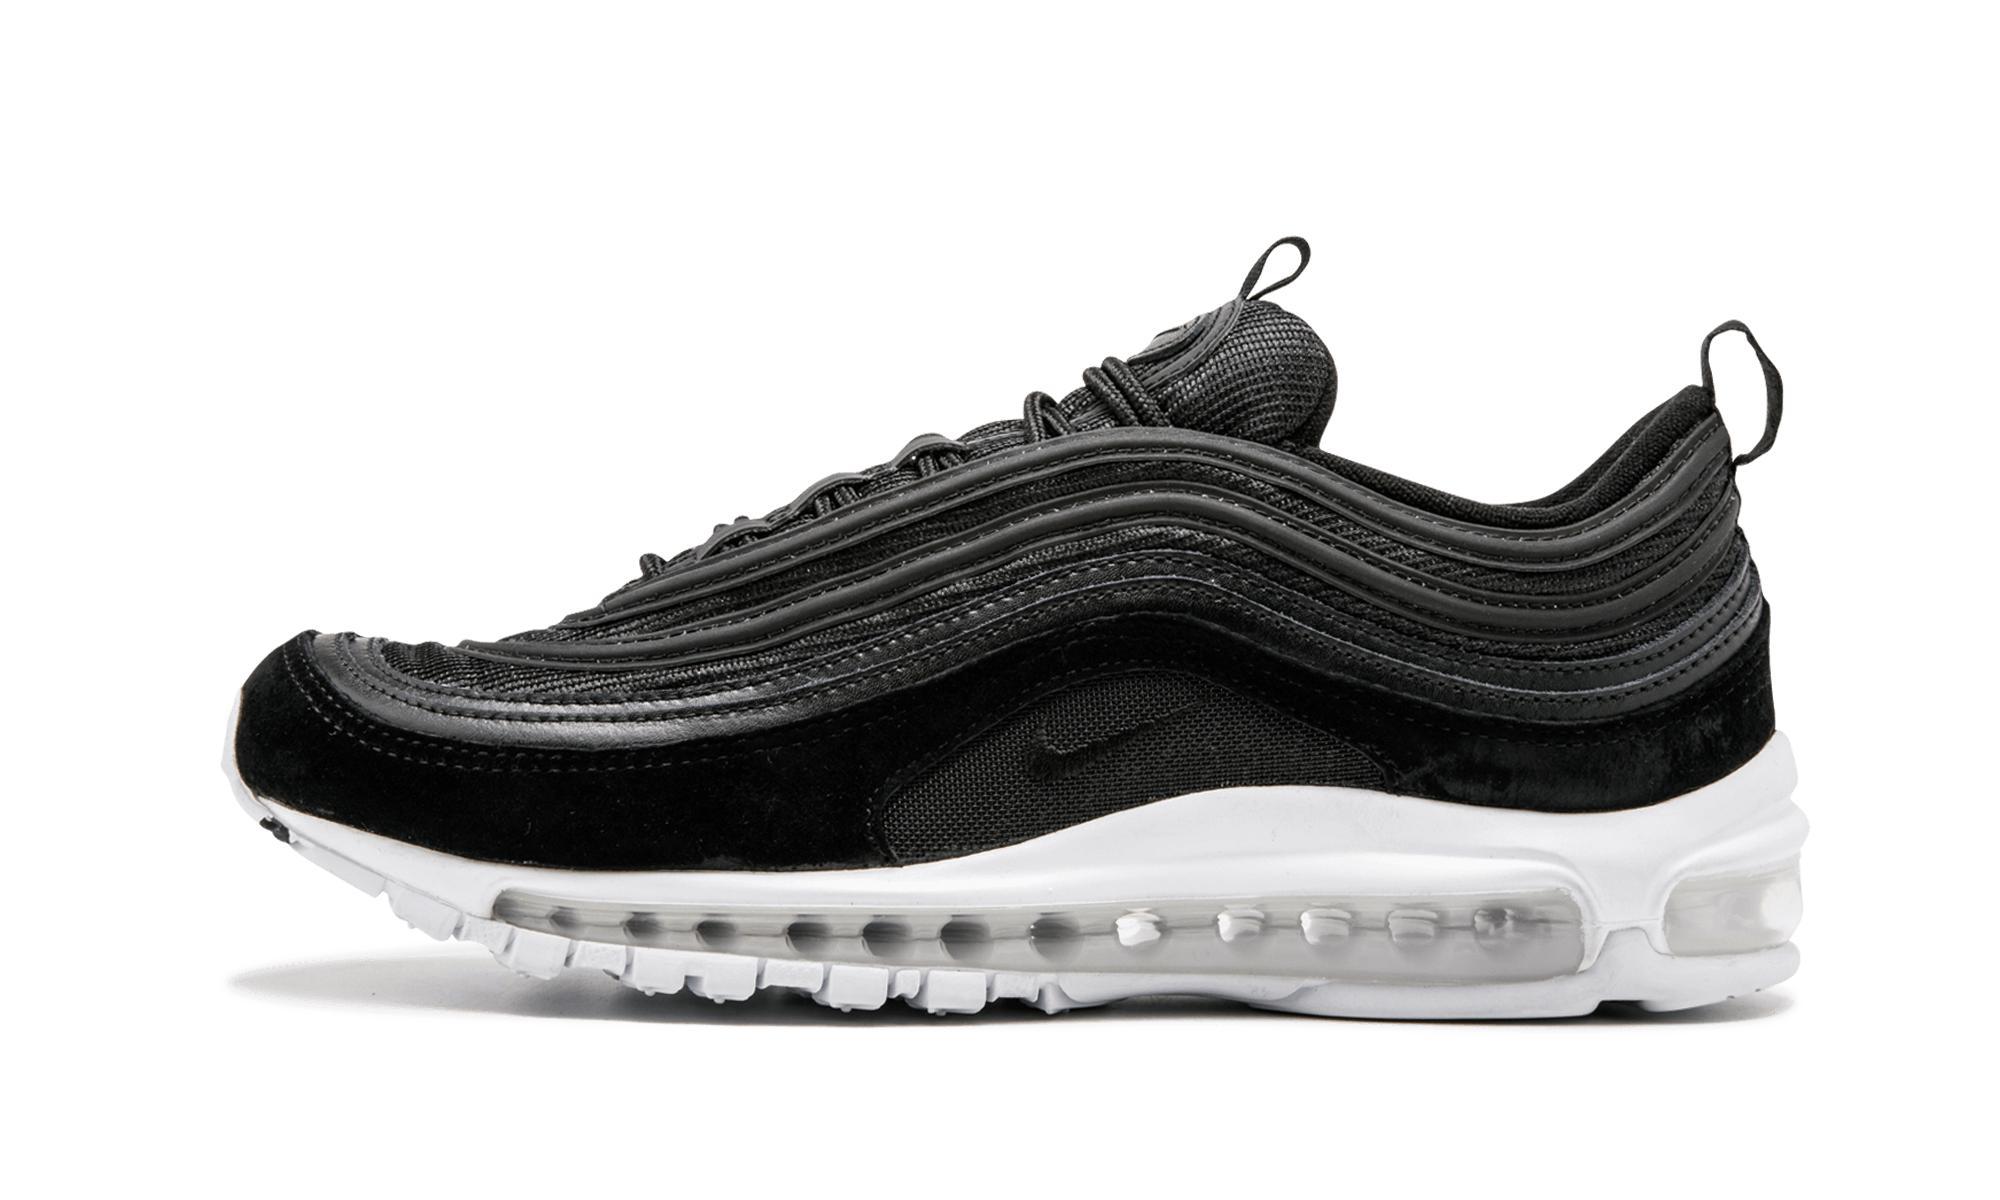 79004179fb3bd Nike Air Max 97 in Black for Men - Save 37.81094527363184% - Lyst